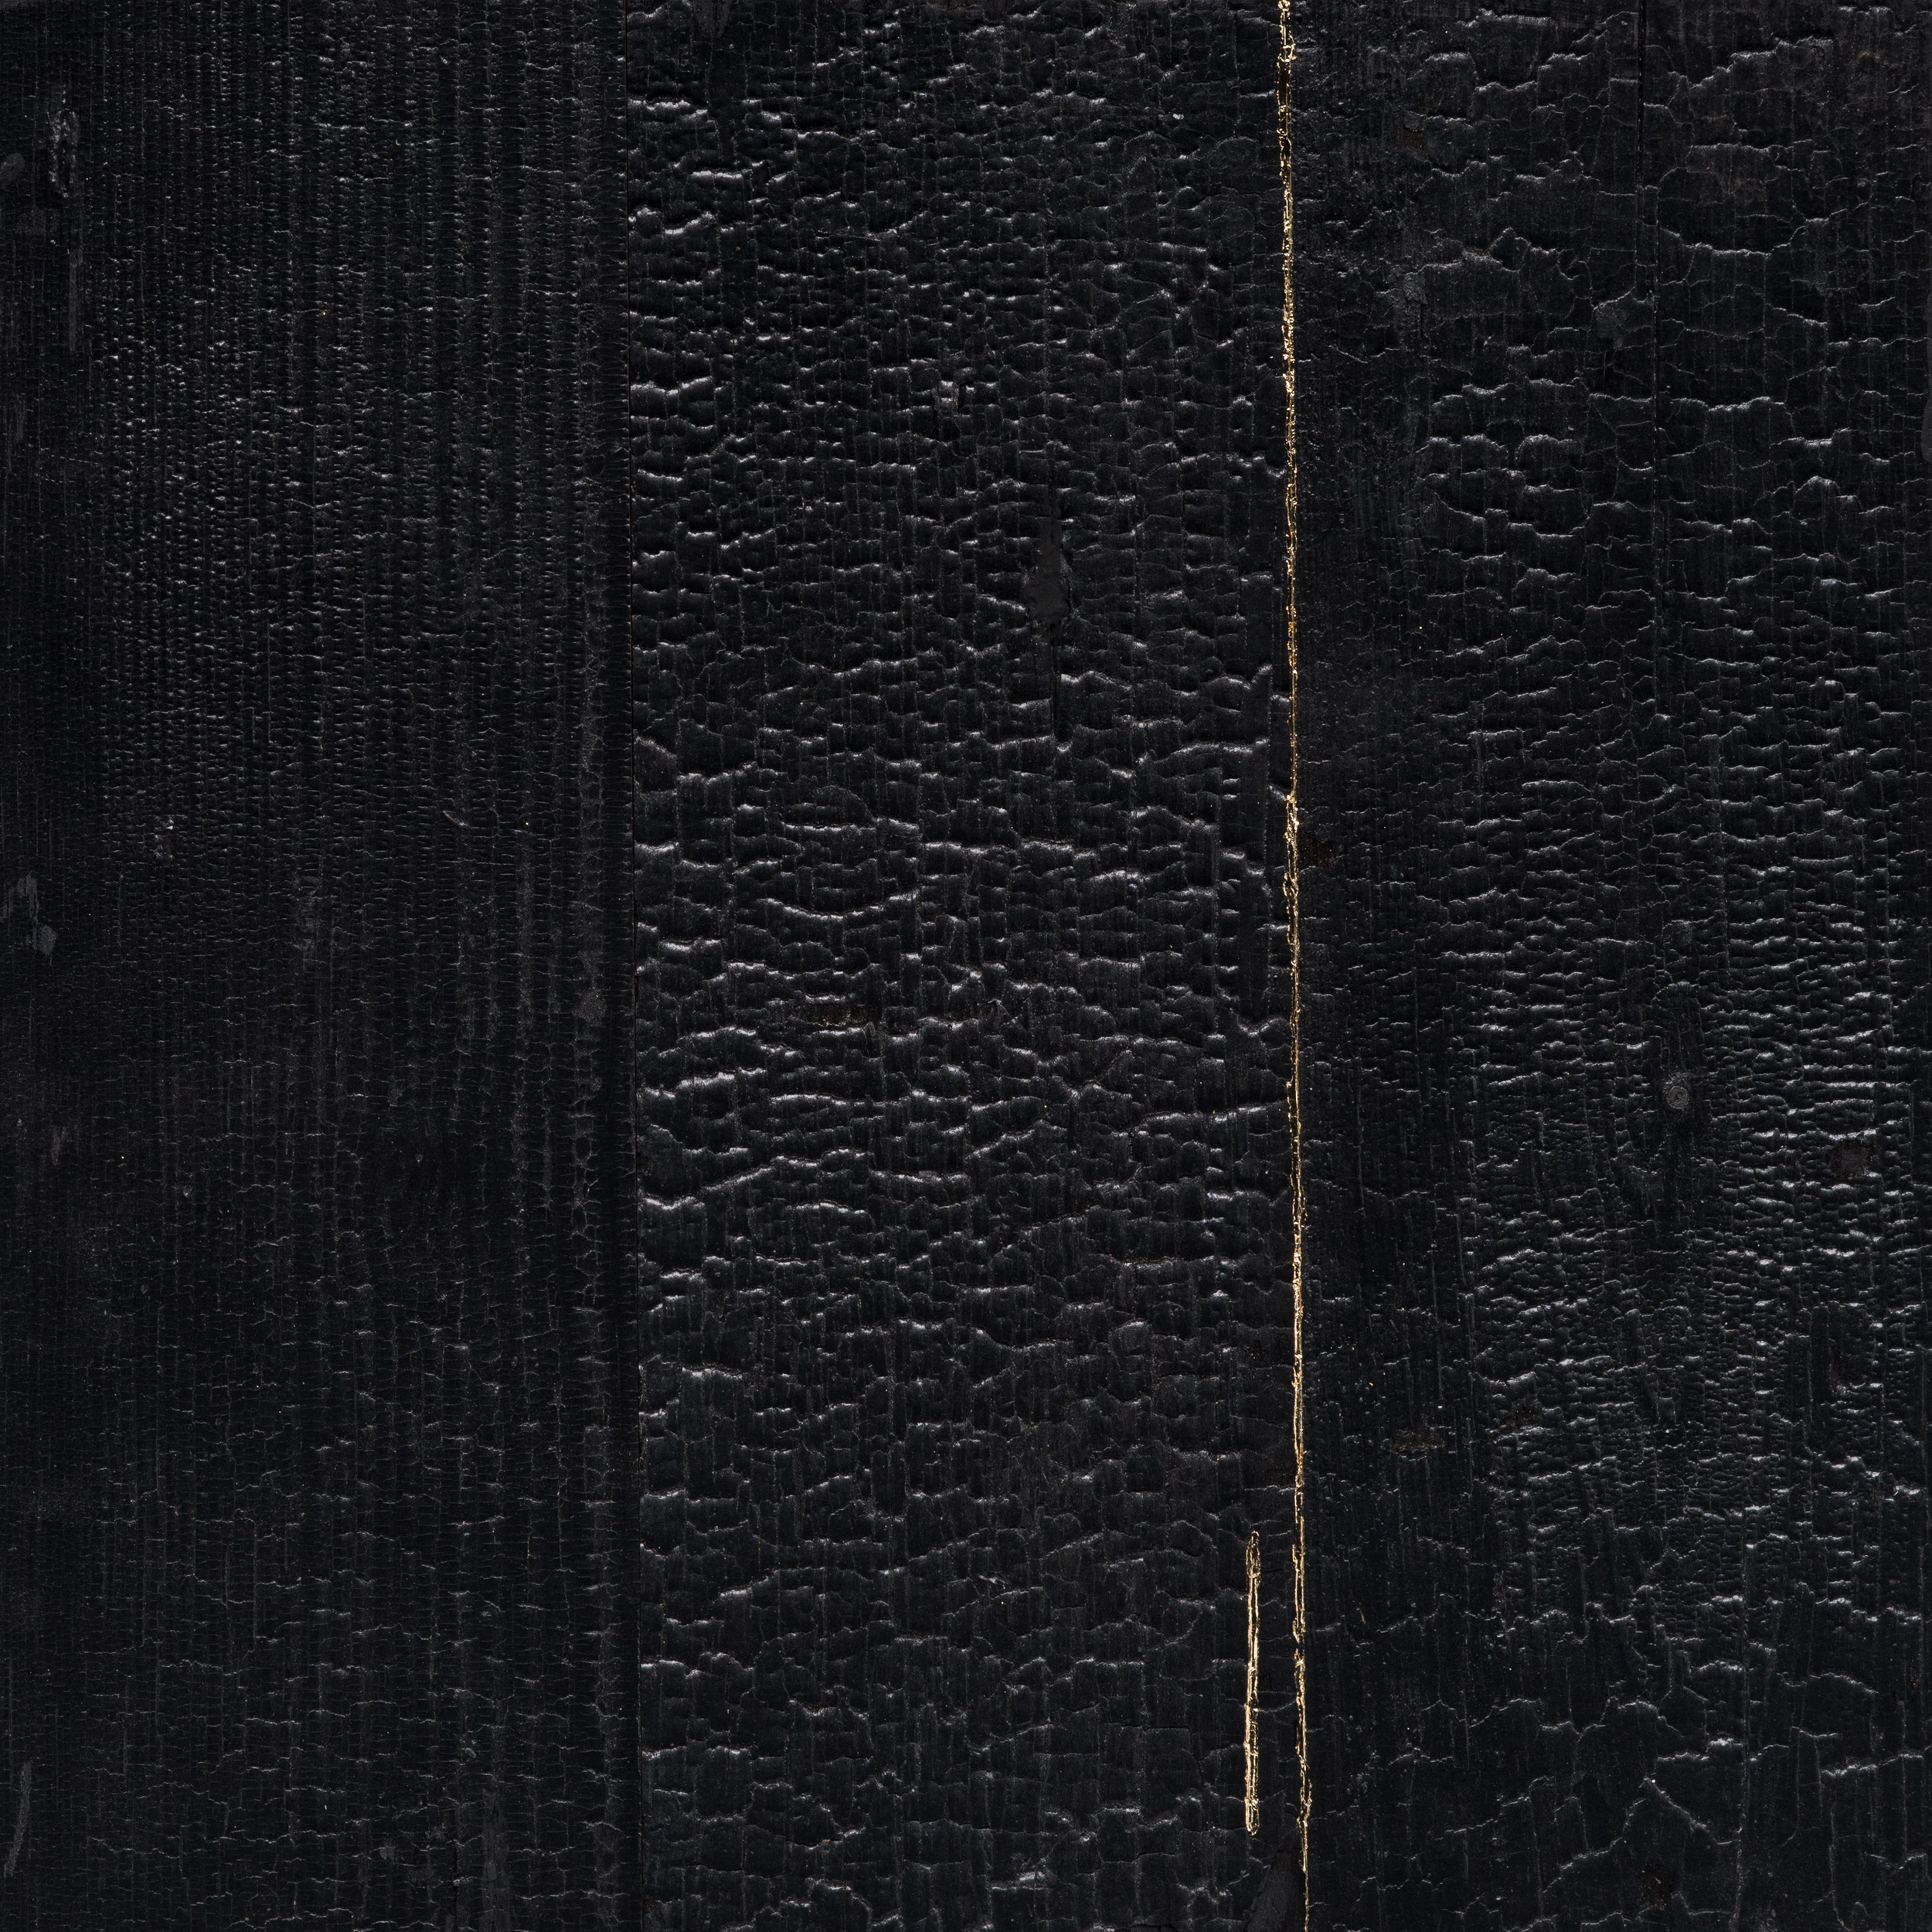 miya ando kintsugi repaired with gold shou sugi ban charred cedar sundaram tagore gallery